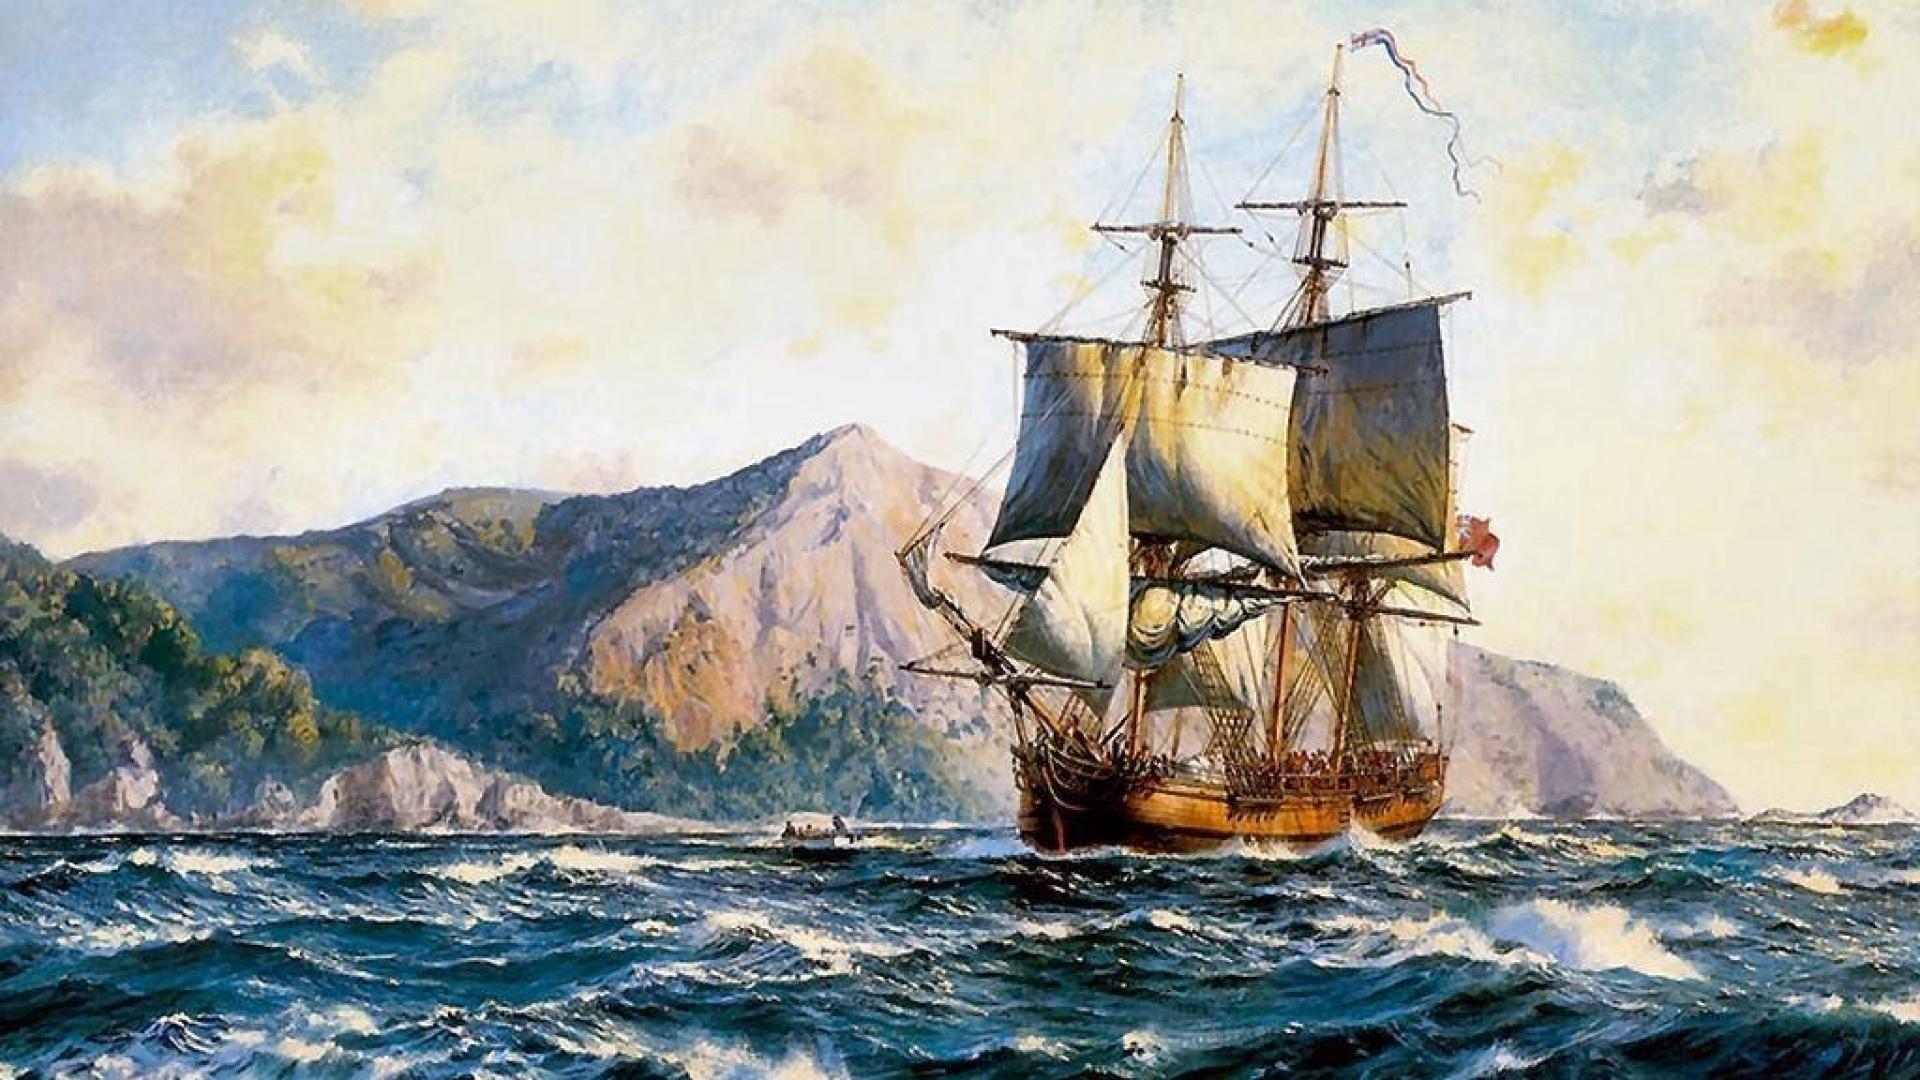 Res: 1920x1080, Tall Ship Wallpaper